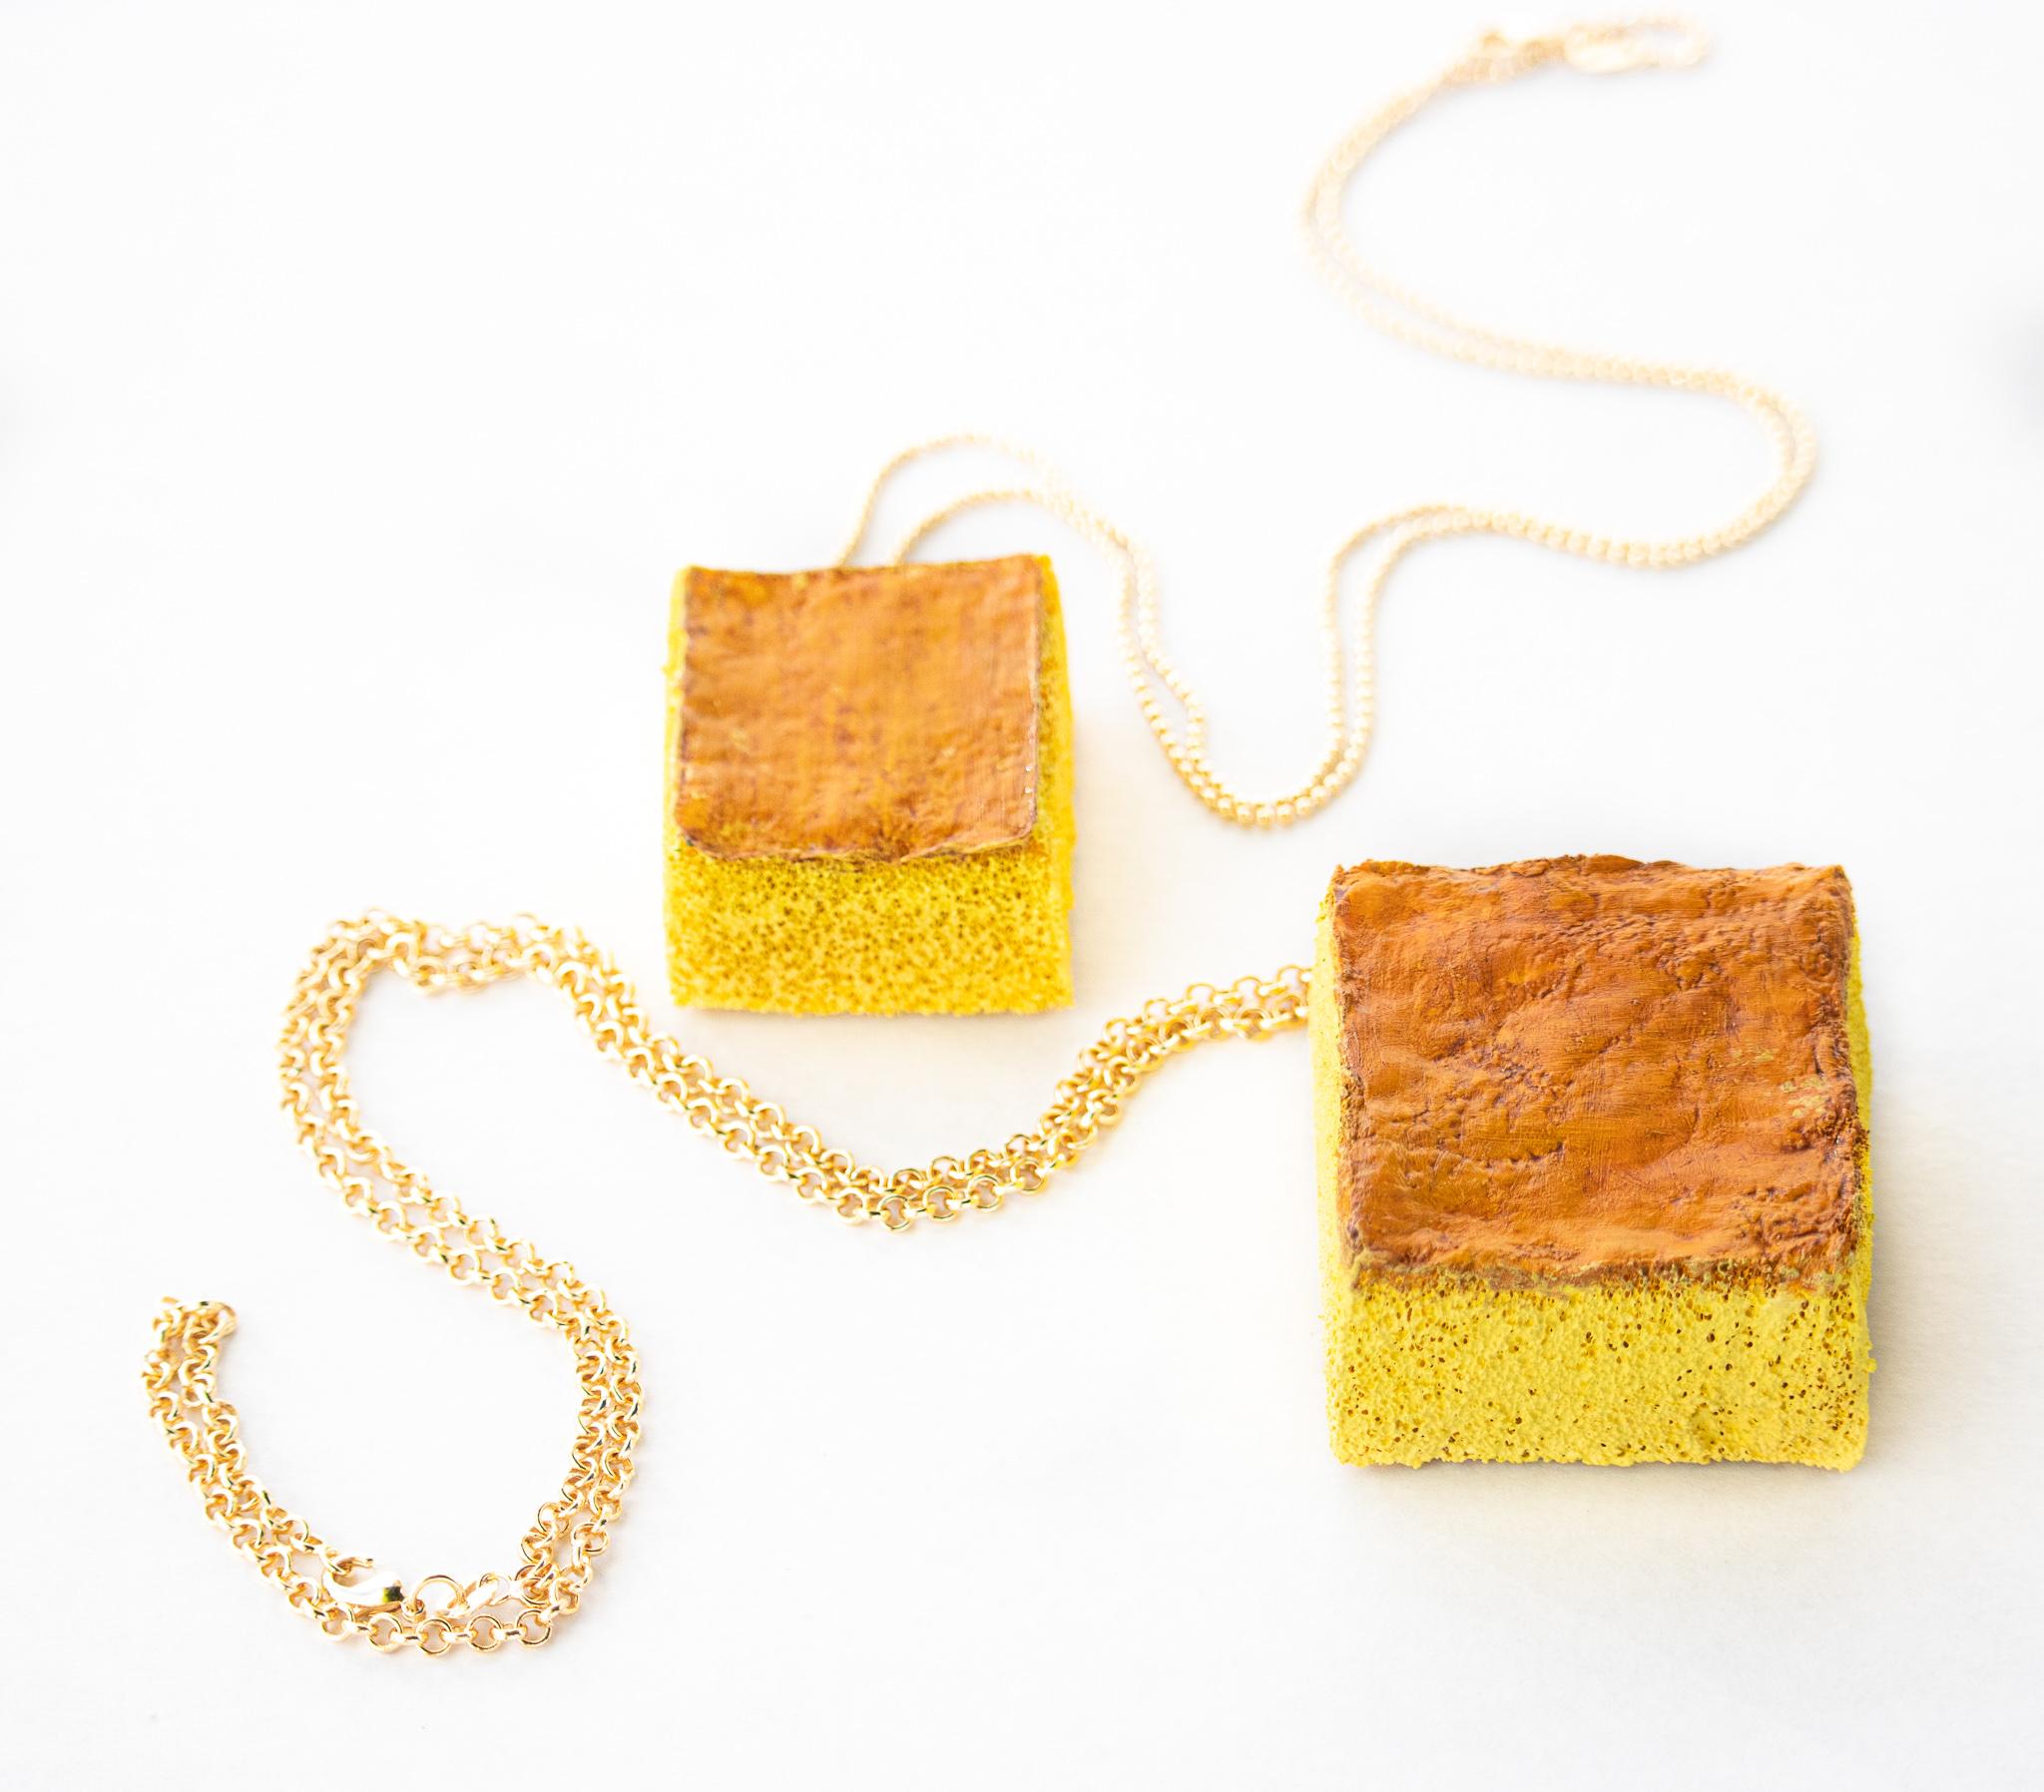 Cornbread (necklace)